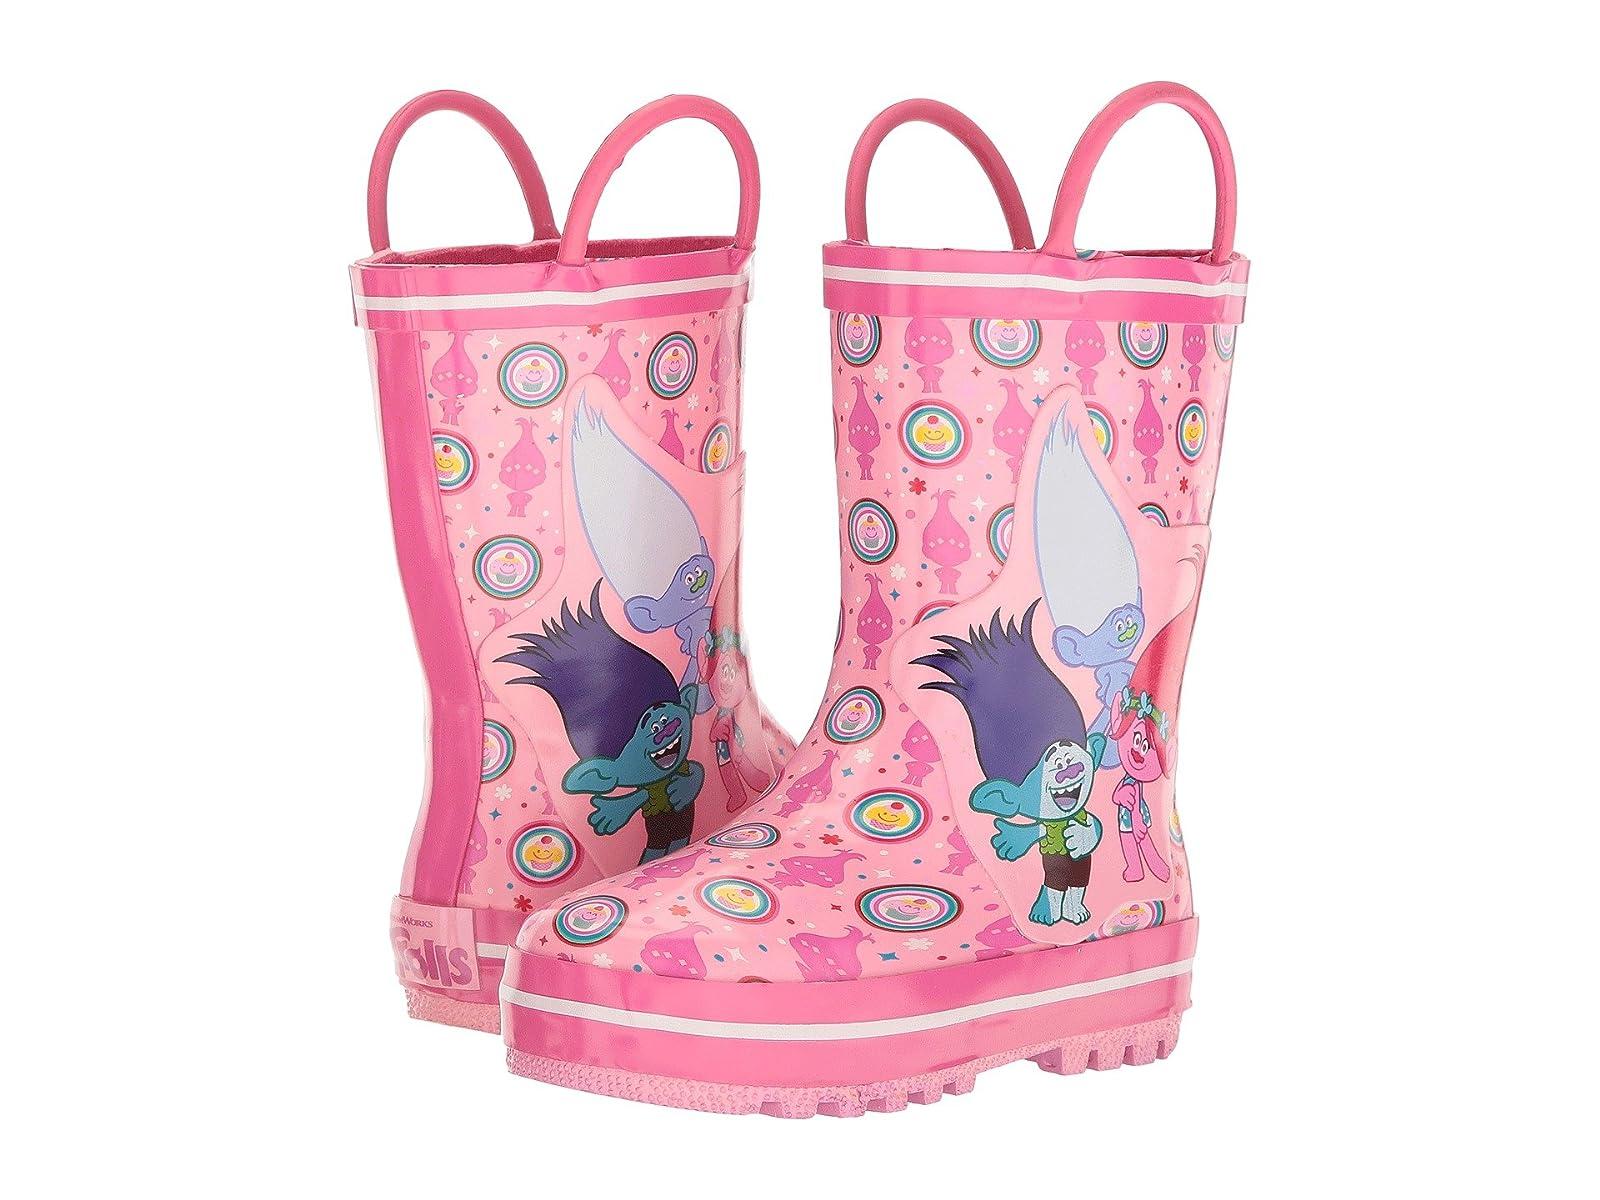 Favorite Rain Characters Trolls Rain Favorite Boots TLF500 (Toddler/Little Kid) 171400